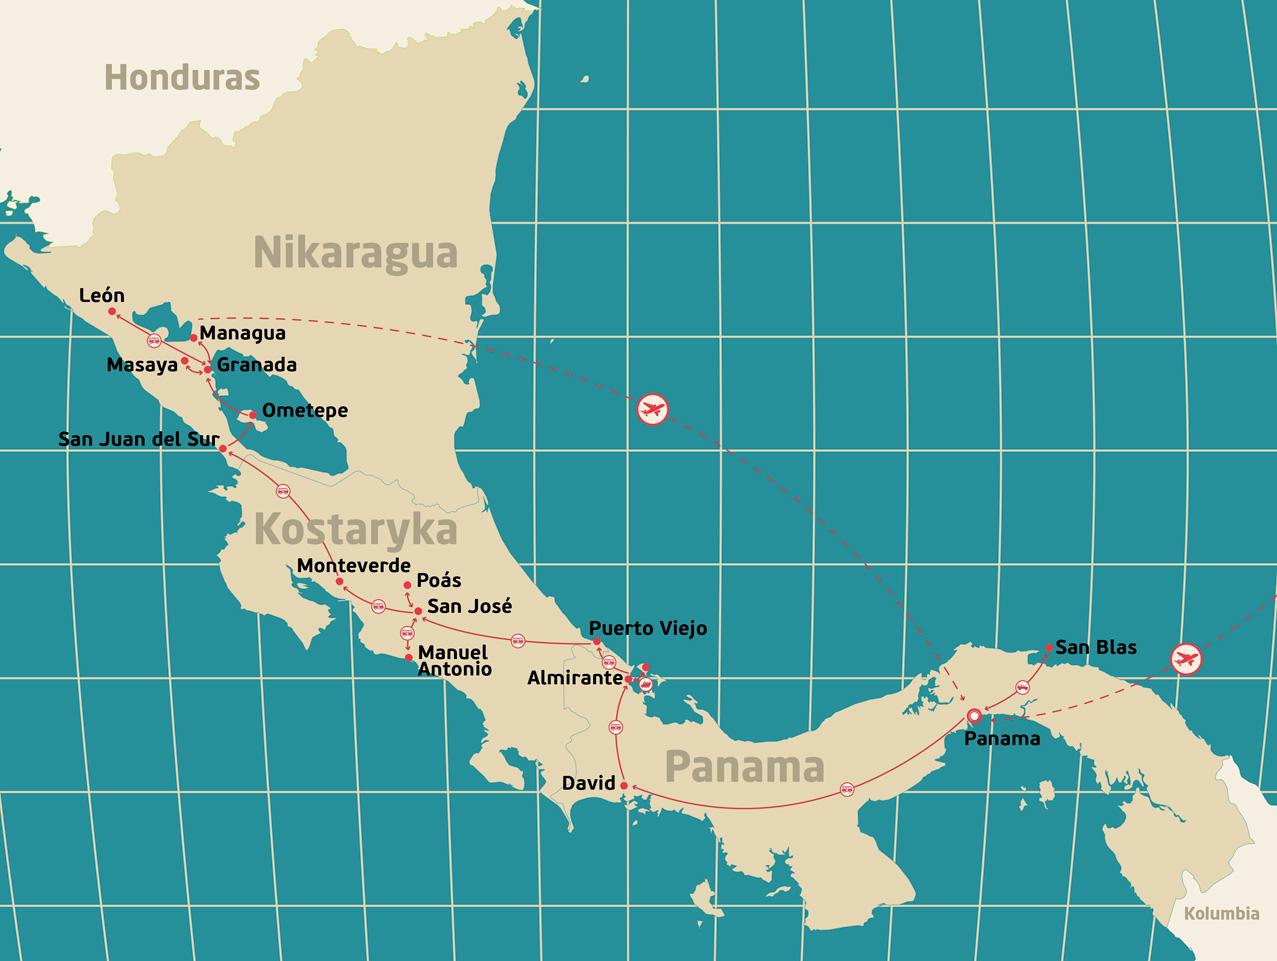 Panama_Kostaryka_Nikaragua